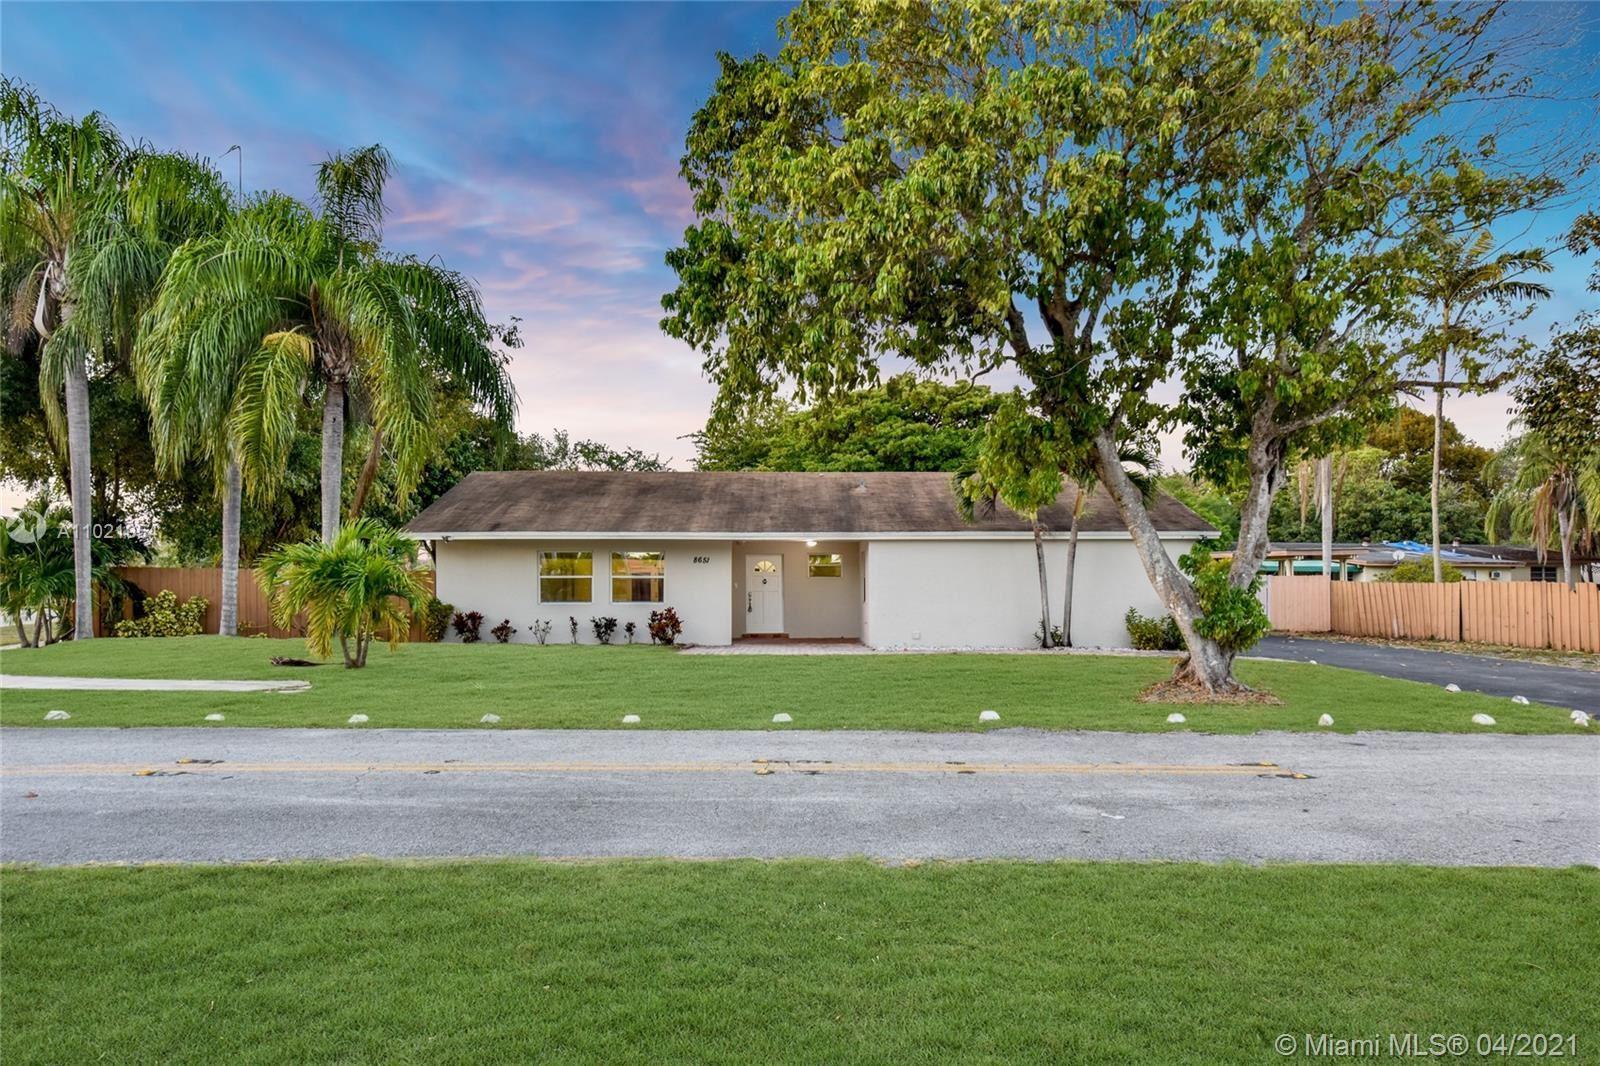 8651 SW 123rd St, Miami, FL 33156 - #: A11021954